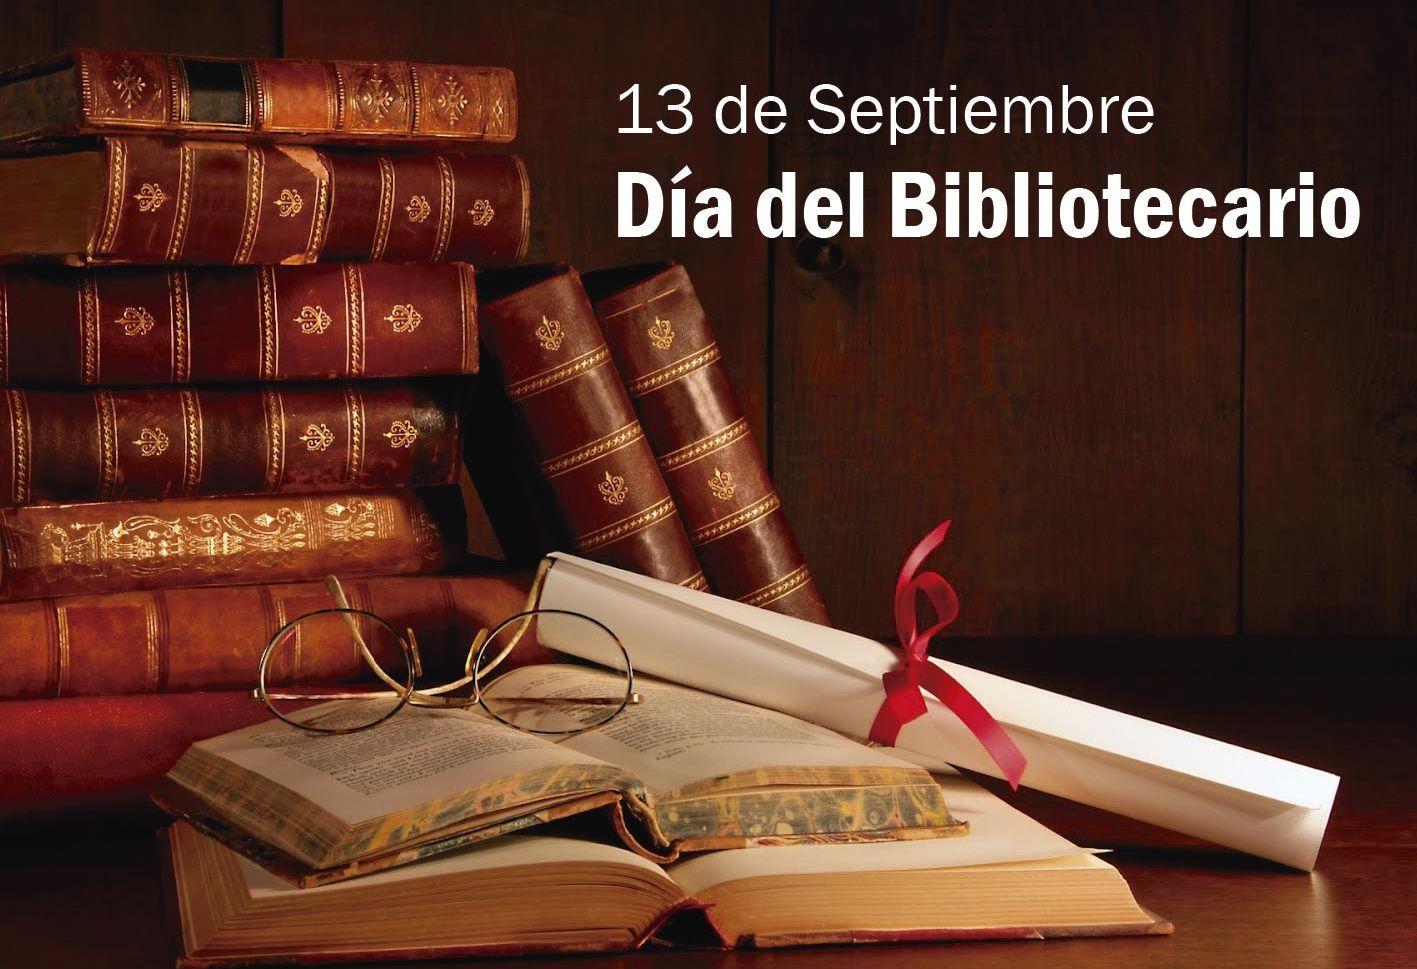 DIA DEL BIBLIOTECARIO